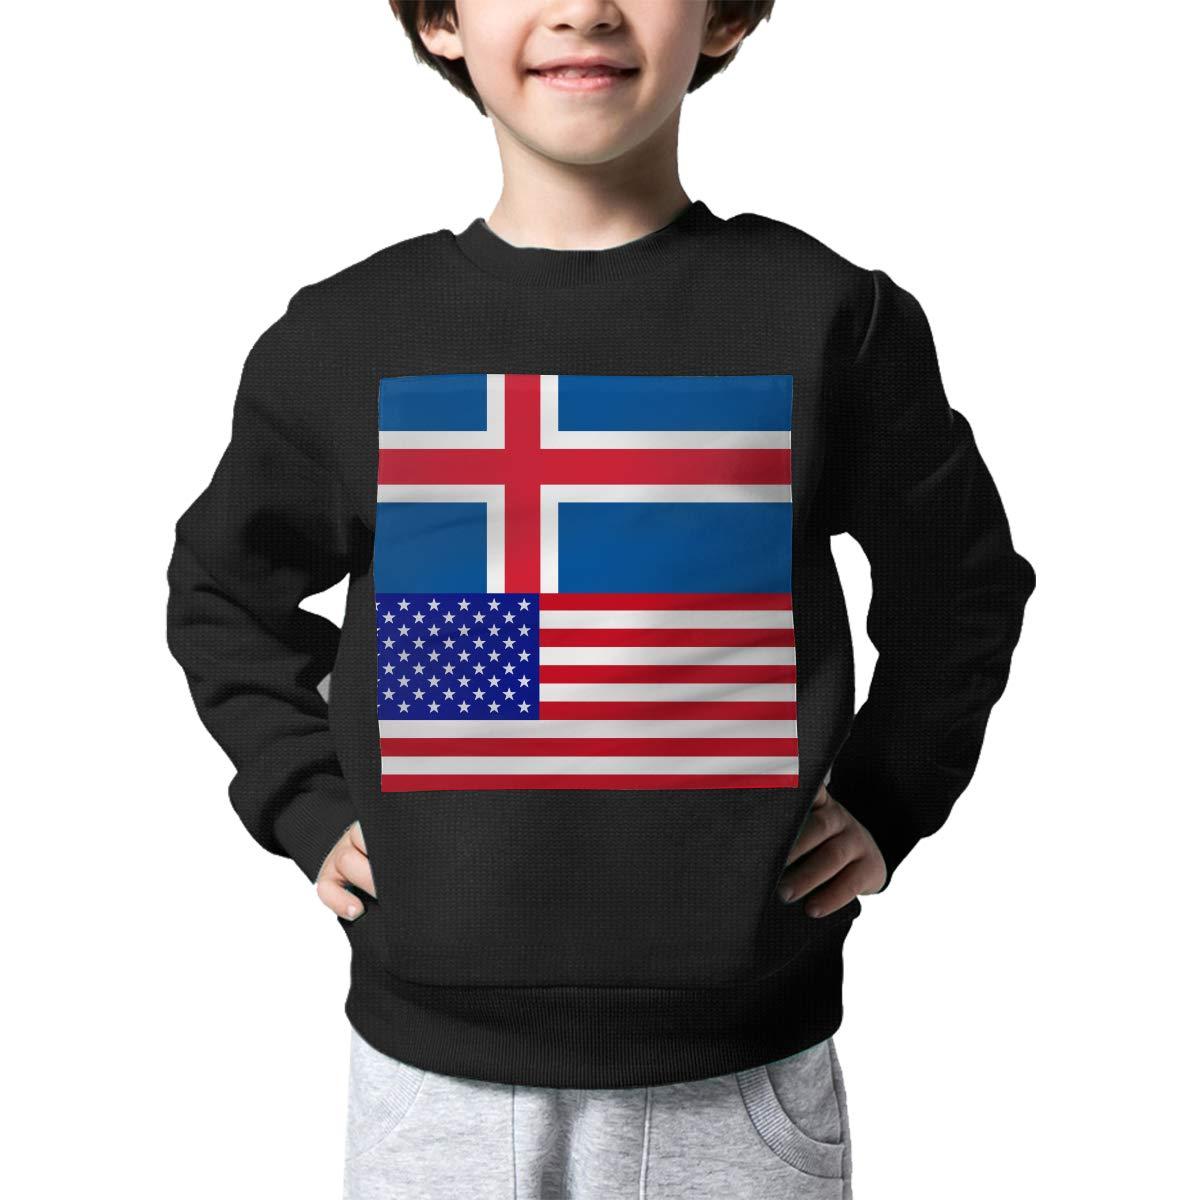 NJKM5MJ Boys Girls Iceland-American Proud Lovely Sweaters Soft Warm Childrens Sweater